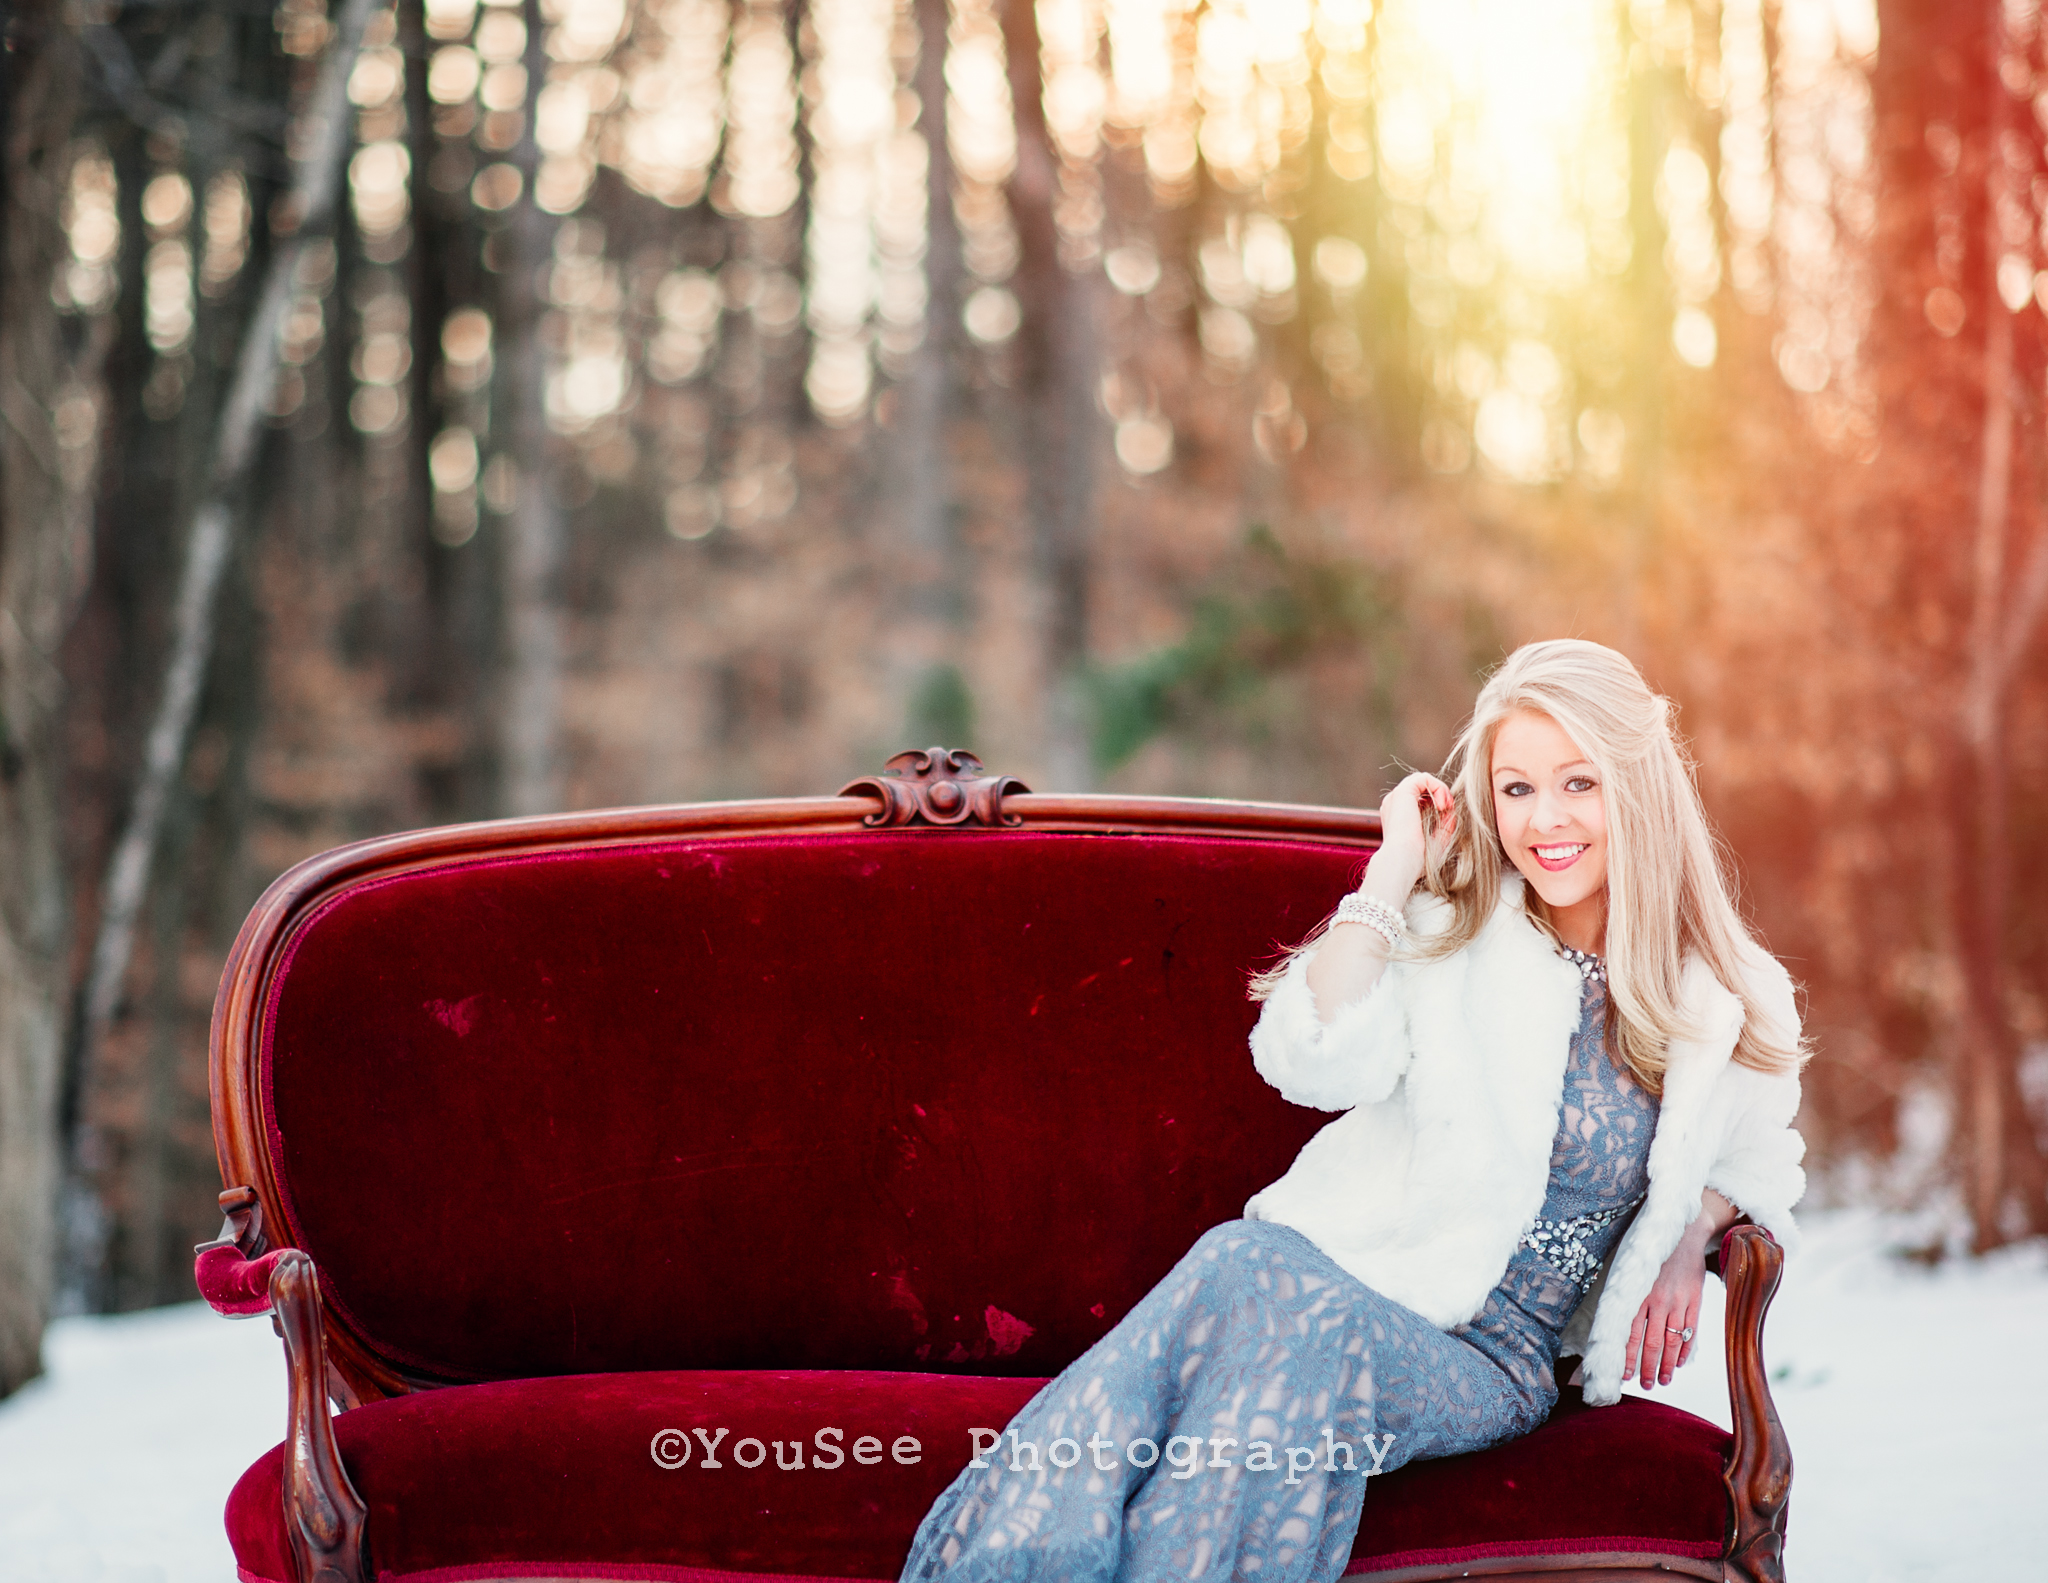 seniorportrait_fredericksburg_photography_winter2 (21)